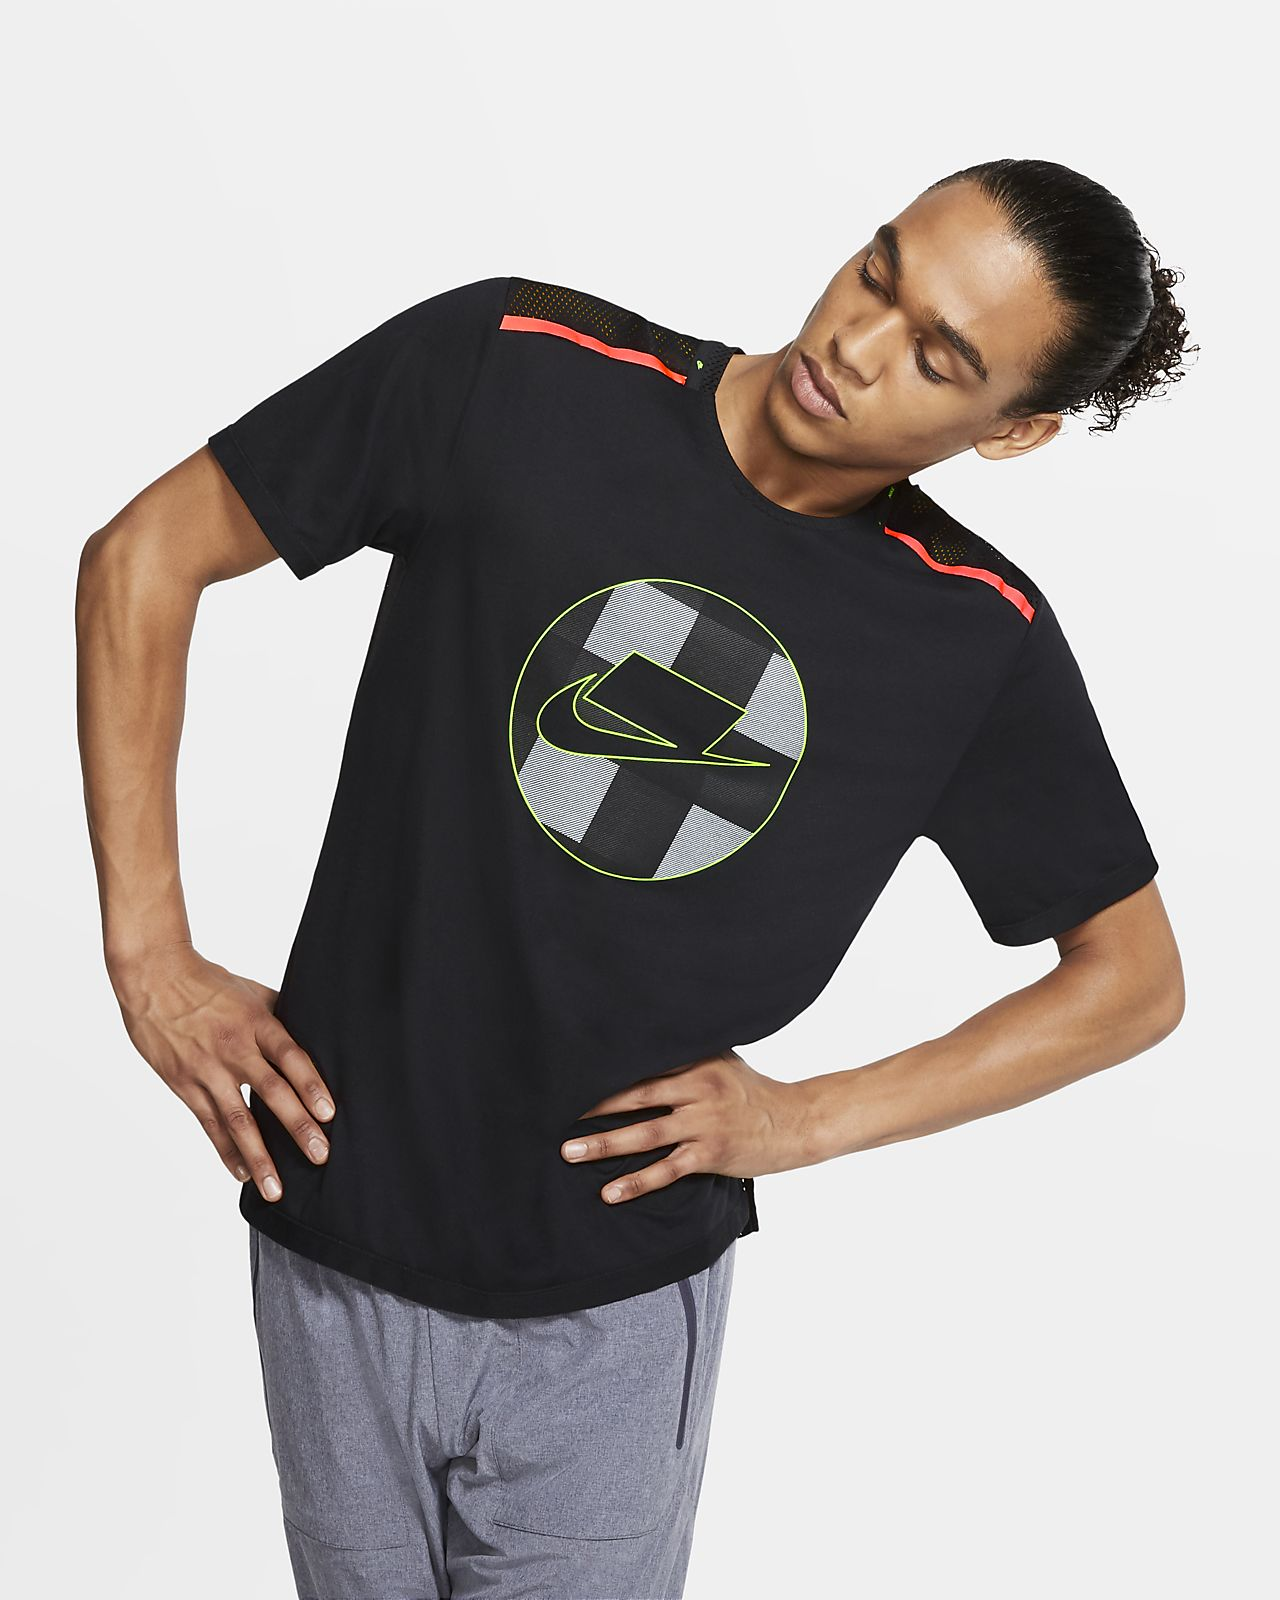 Nike Wild Run Men's Short-Sleeve Mesh Running Top